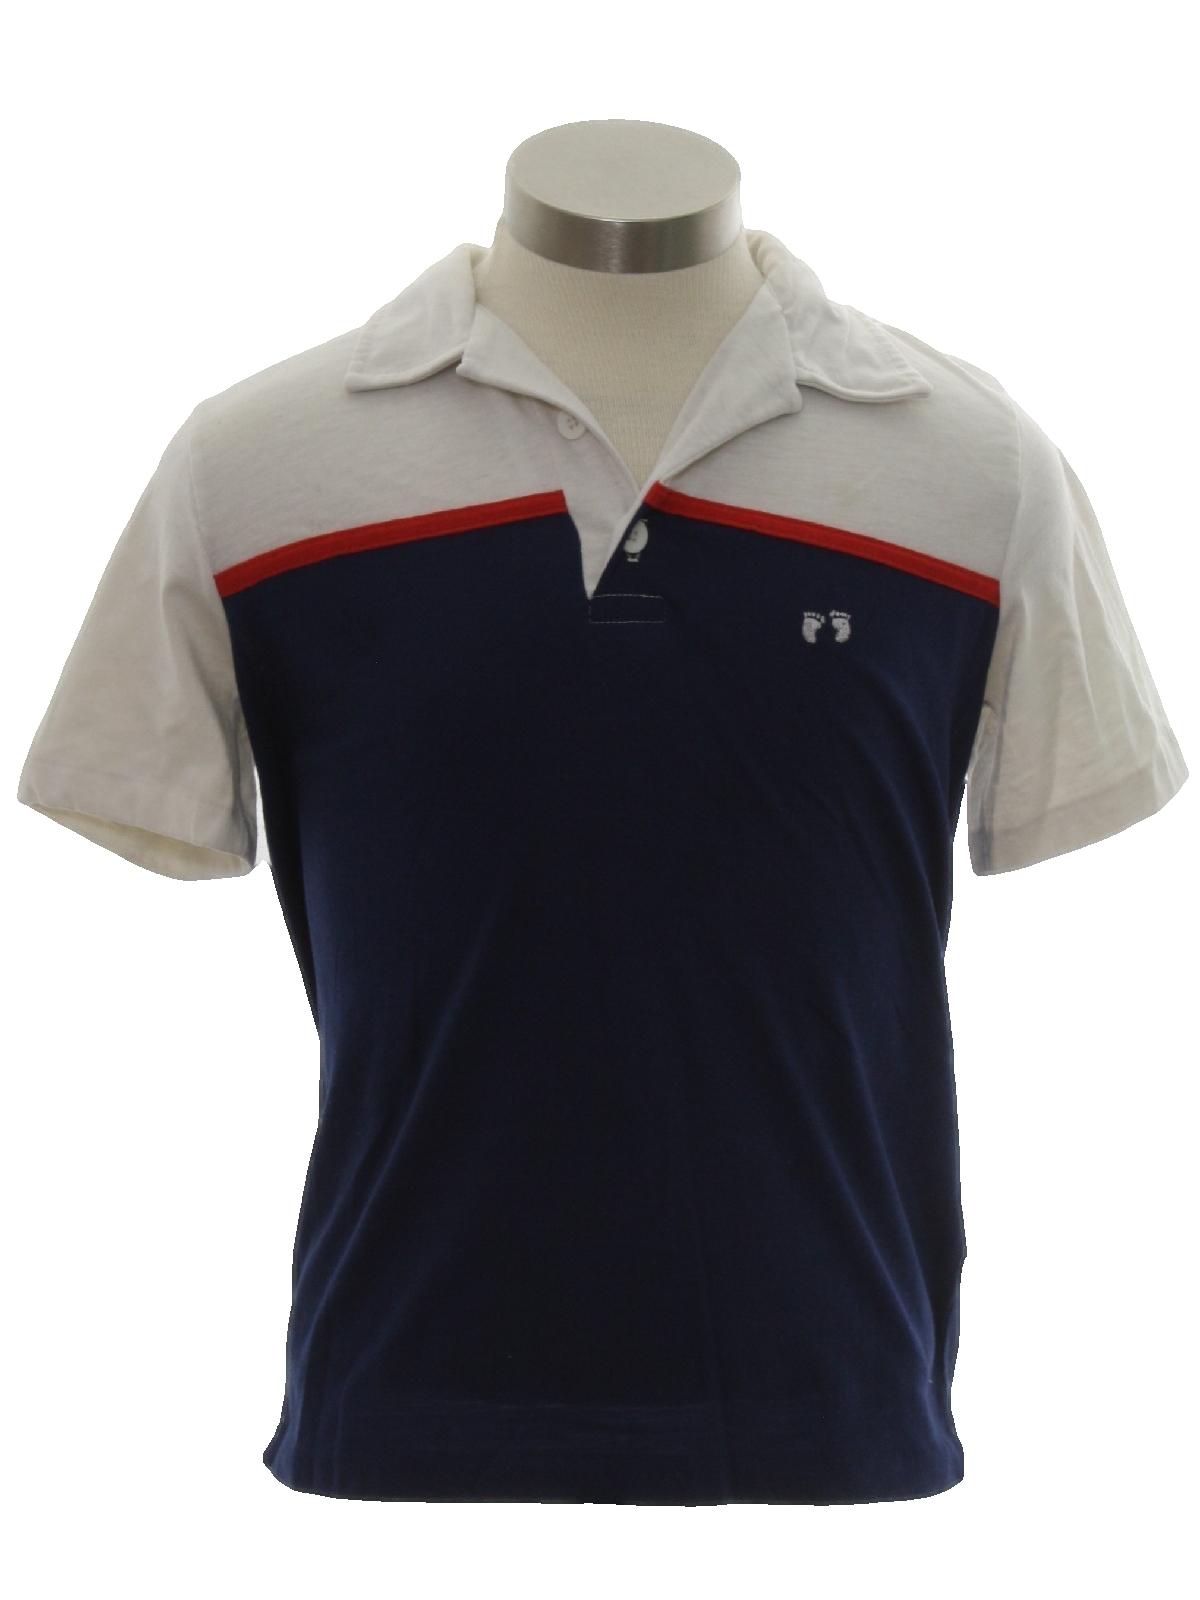 37c3ec48 Retro 80's Shirt: 80s -Hang Ten- Mens/Boys white and navy blue ...